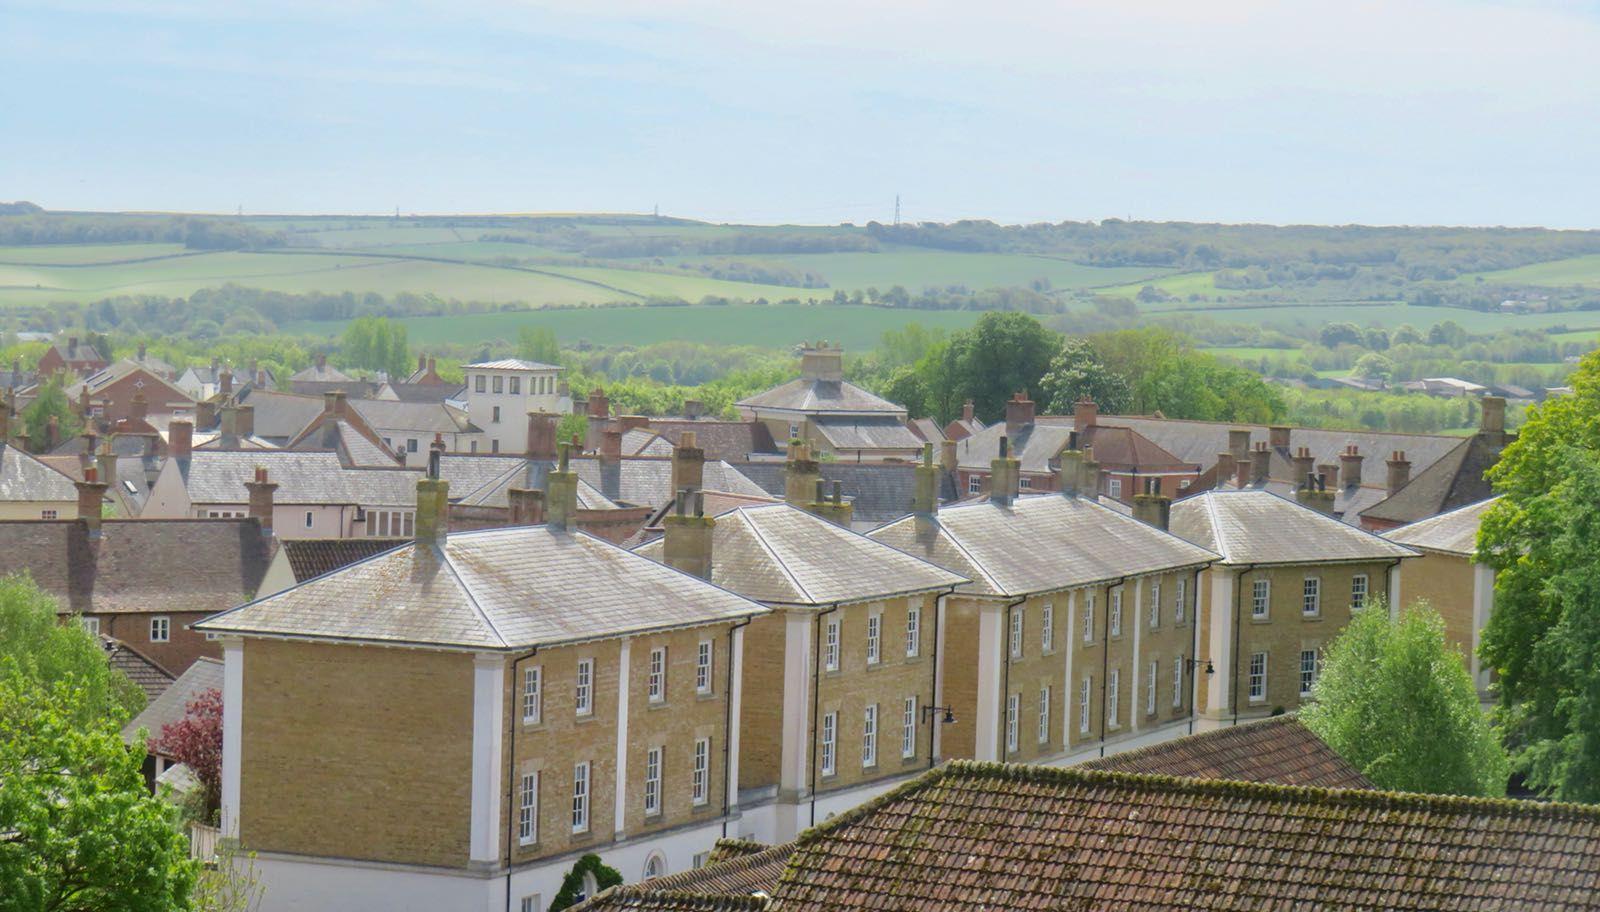 Poundbury Rooftops